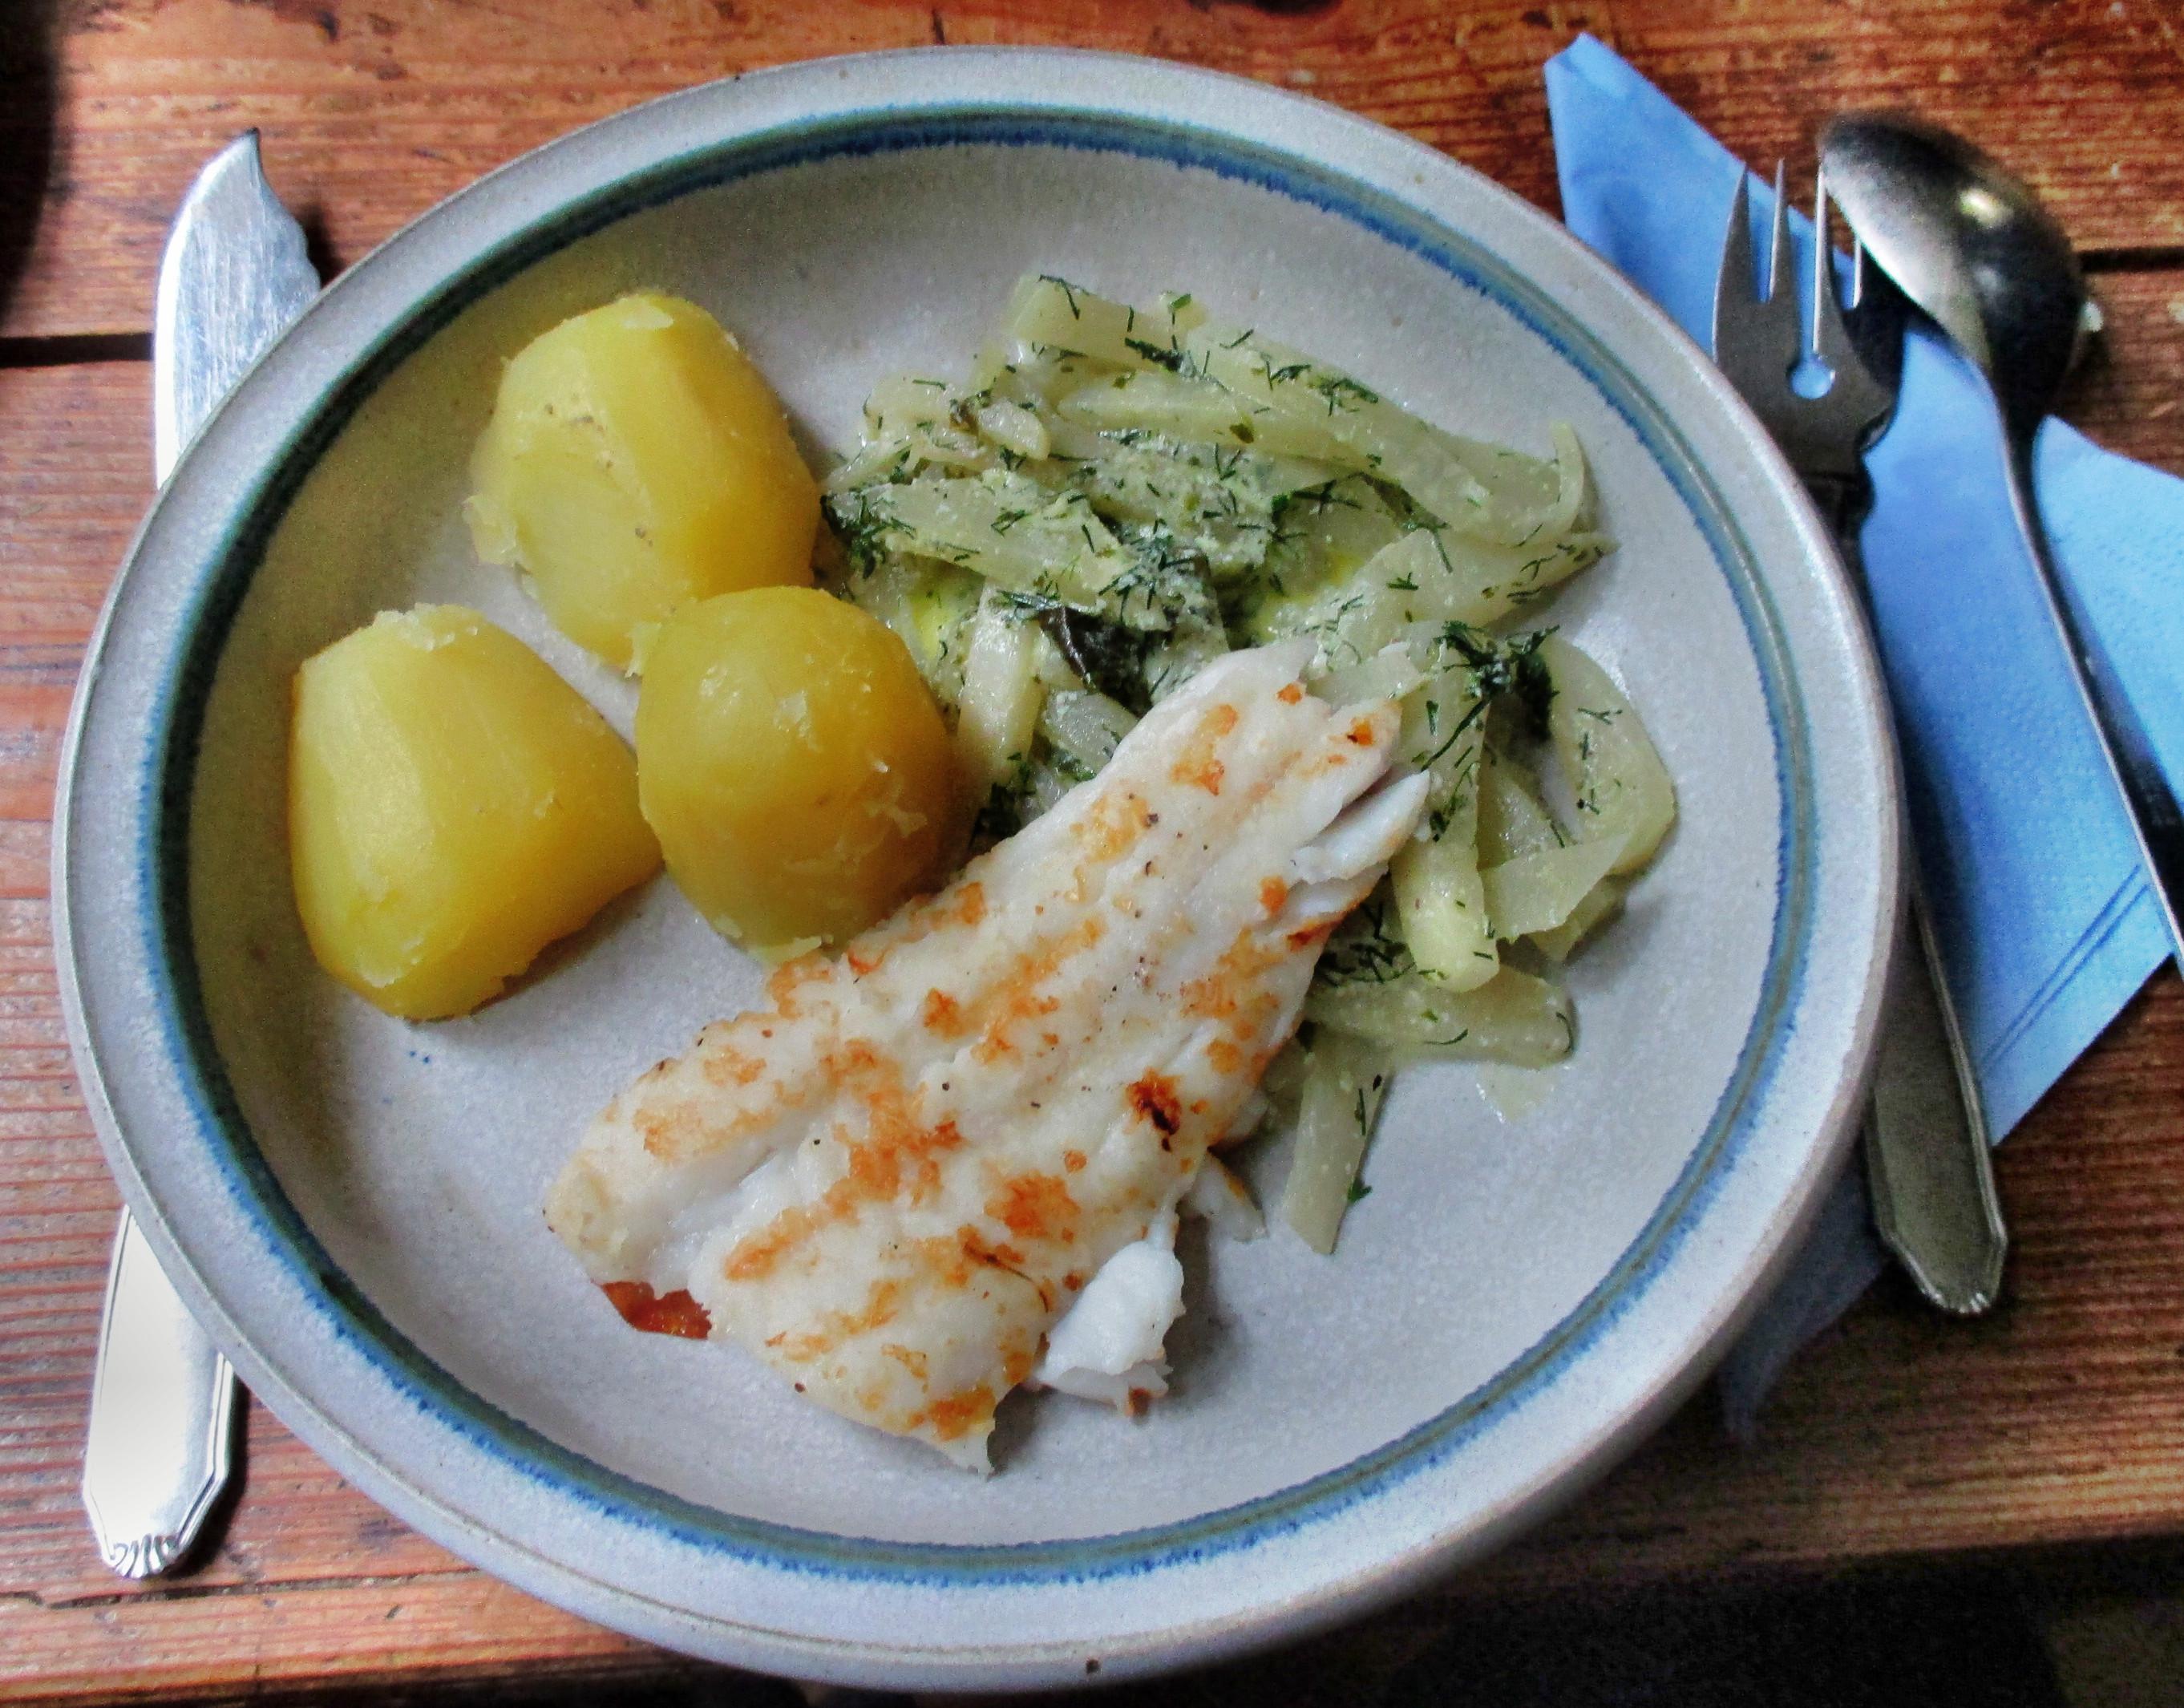 Kabeljau,Kohlrabigemüse,Salzkartoffeln,Salat -9.6.15   (10)